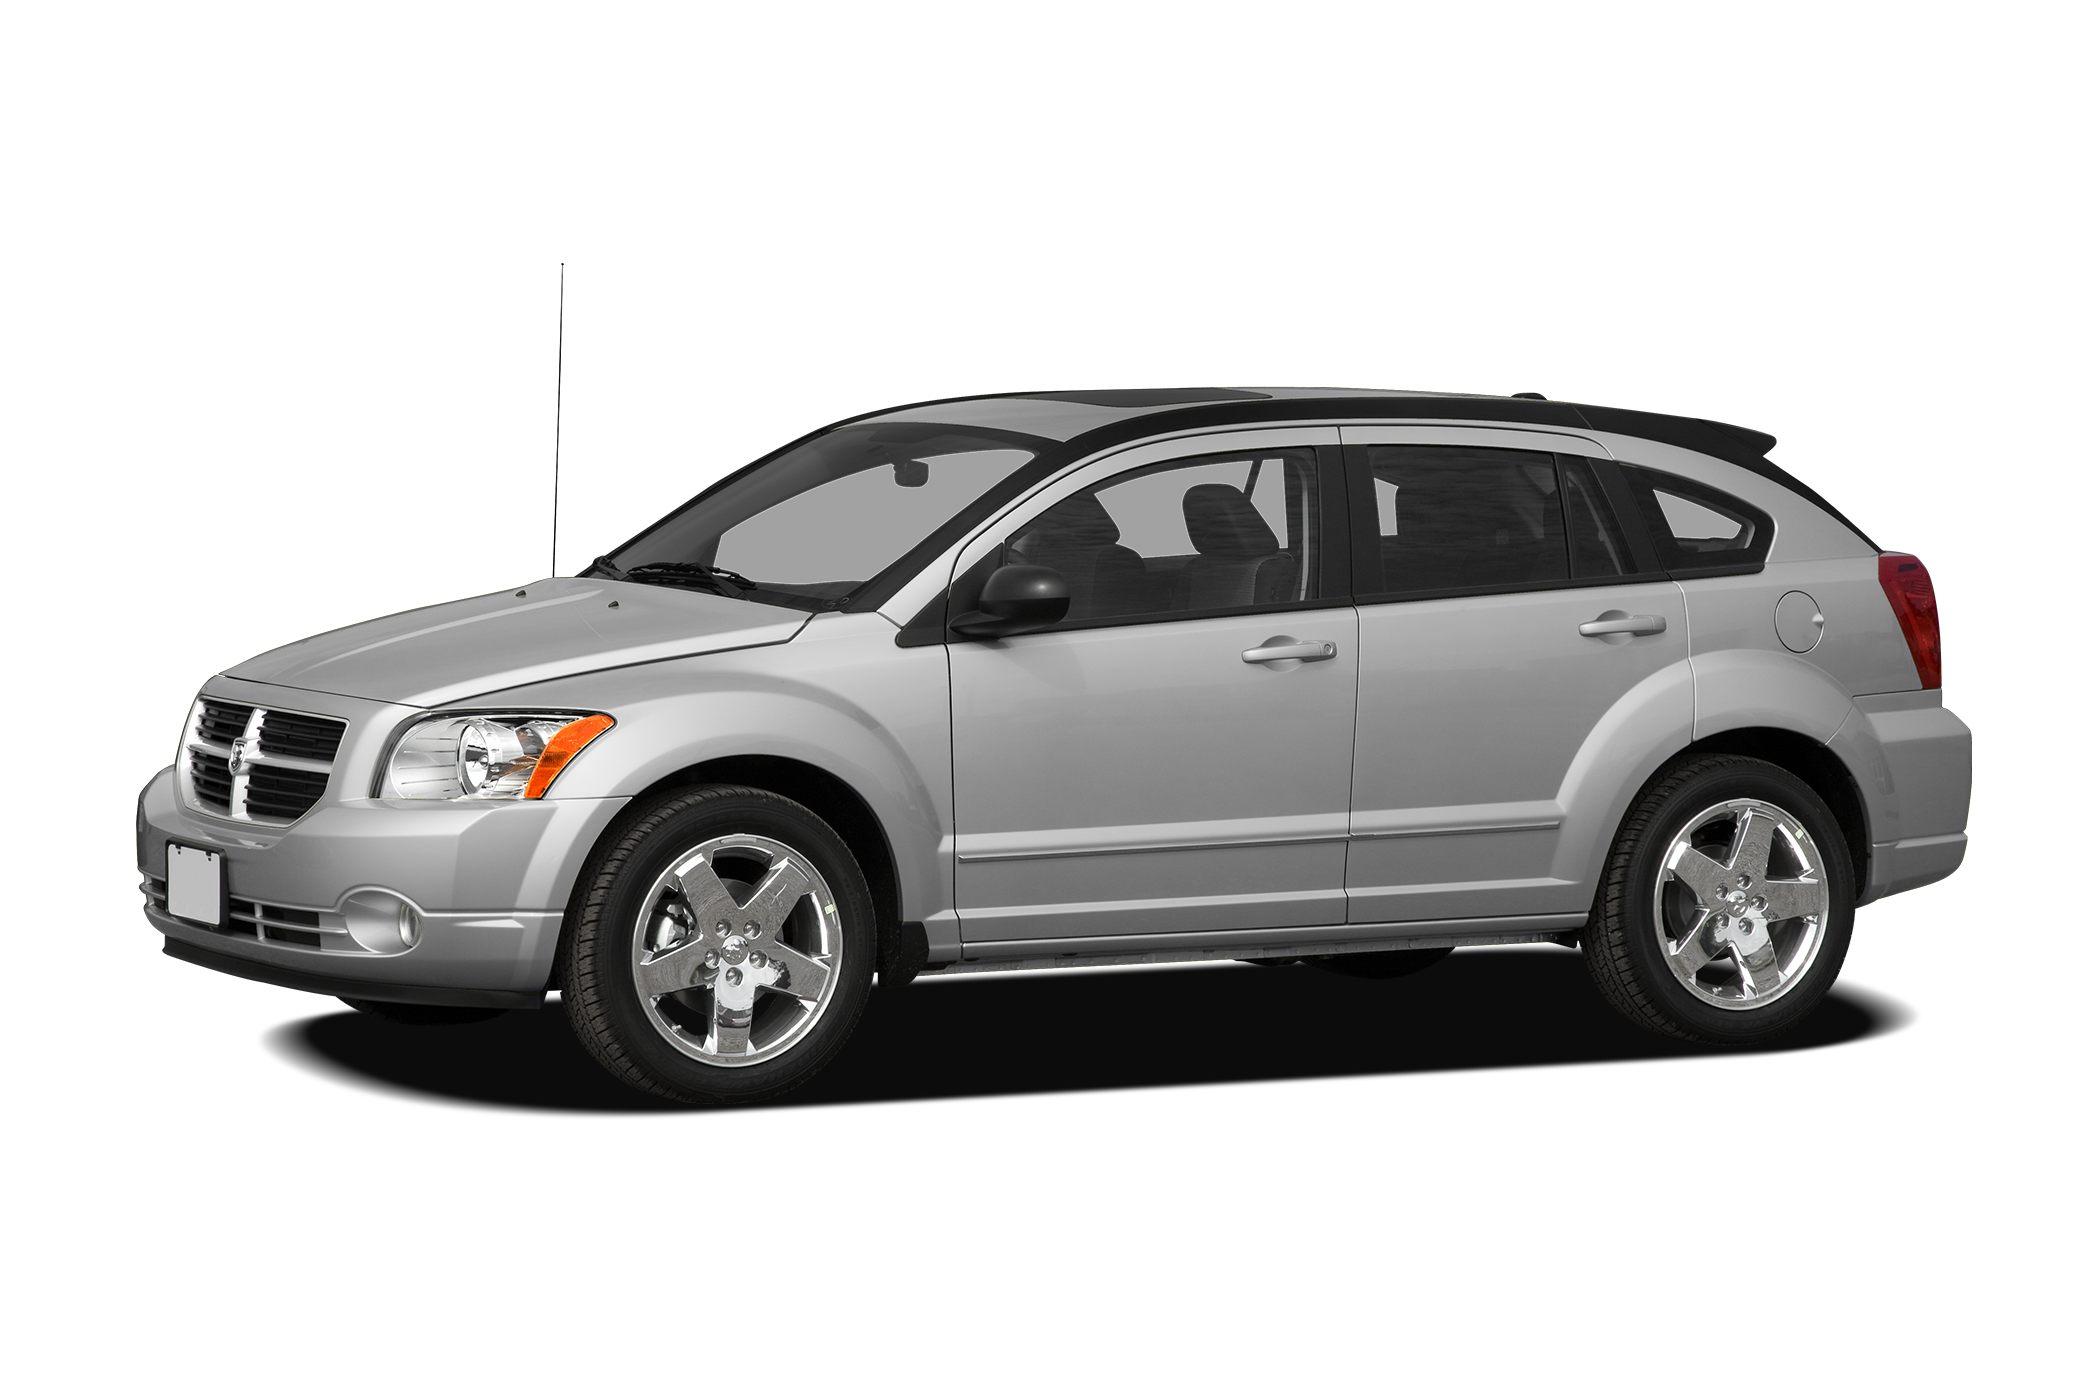 2012 Dodge Caliber SXT Miles 30489Stock STK531765 VIN 1C3CDWDA1CD531765